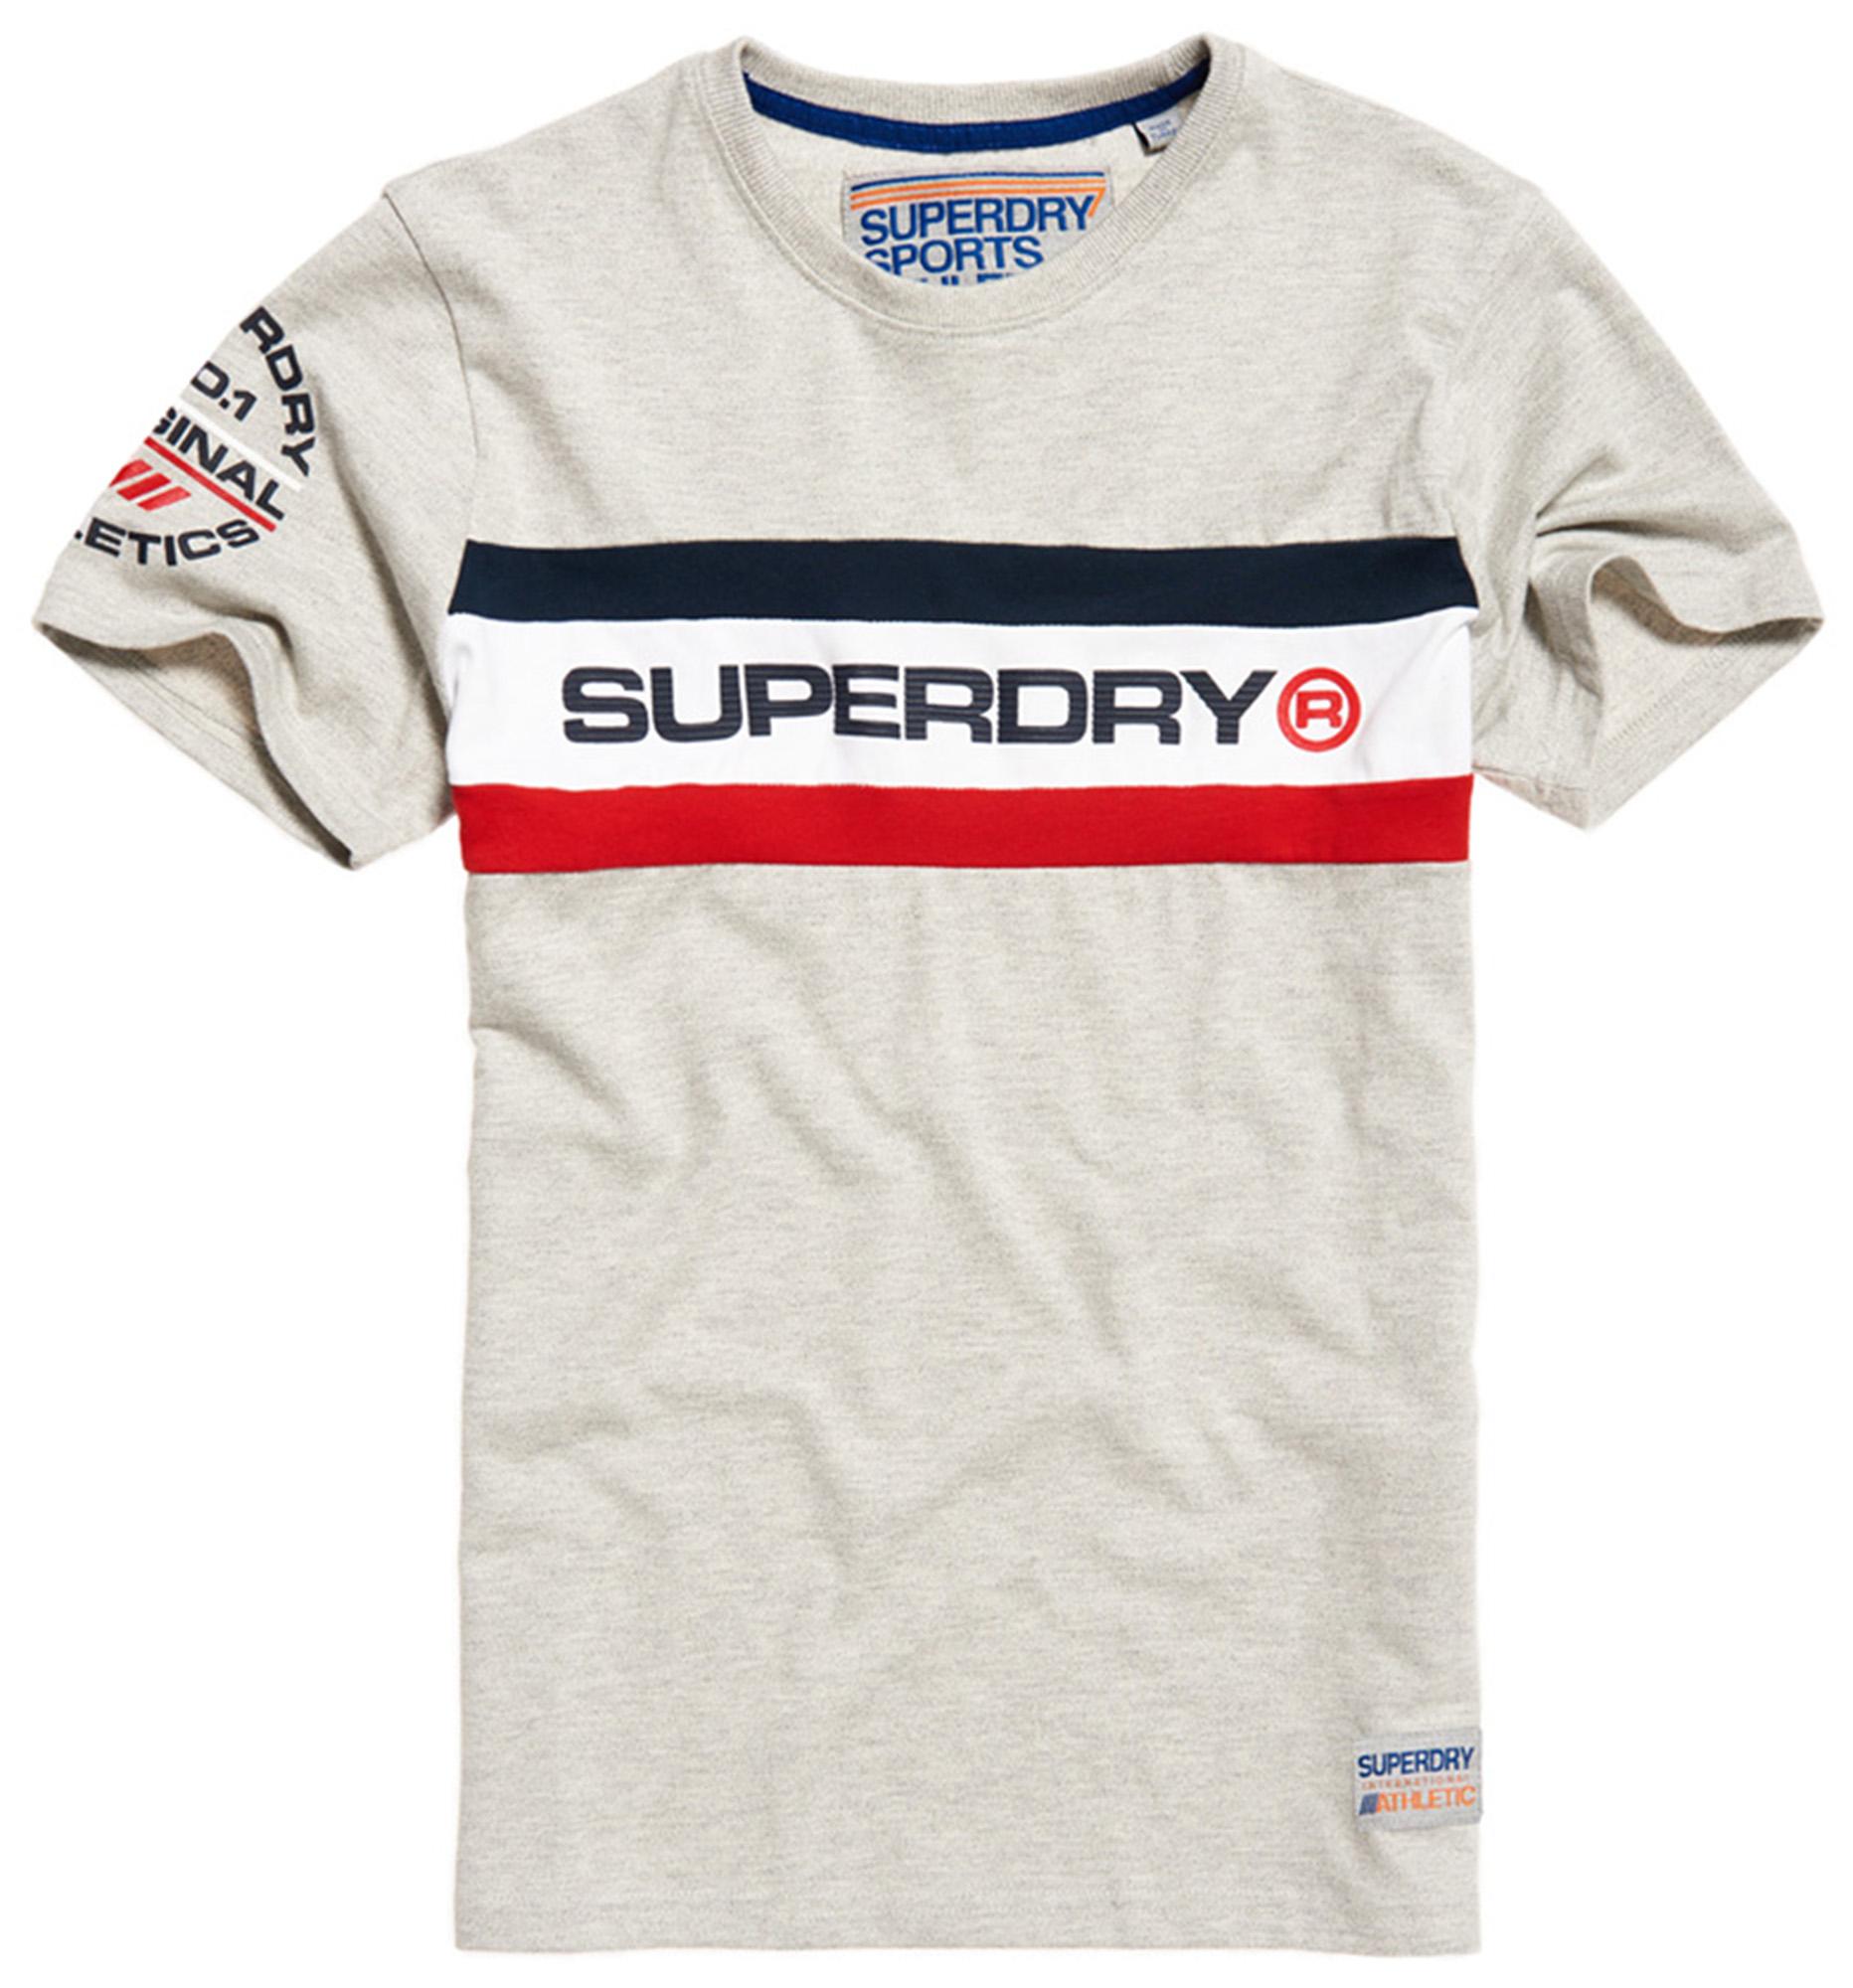 Superdry New Orange Label Crew Neck T-shirt Plain Cotton Tee Neon Optic White